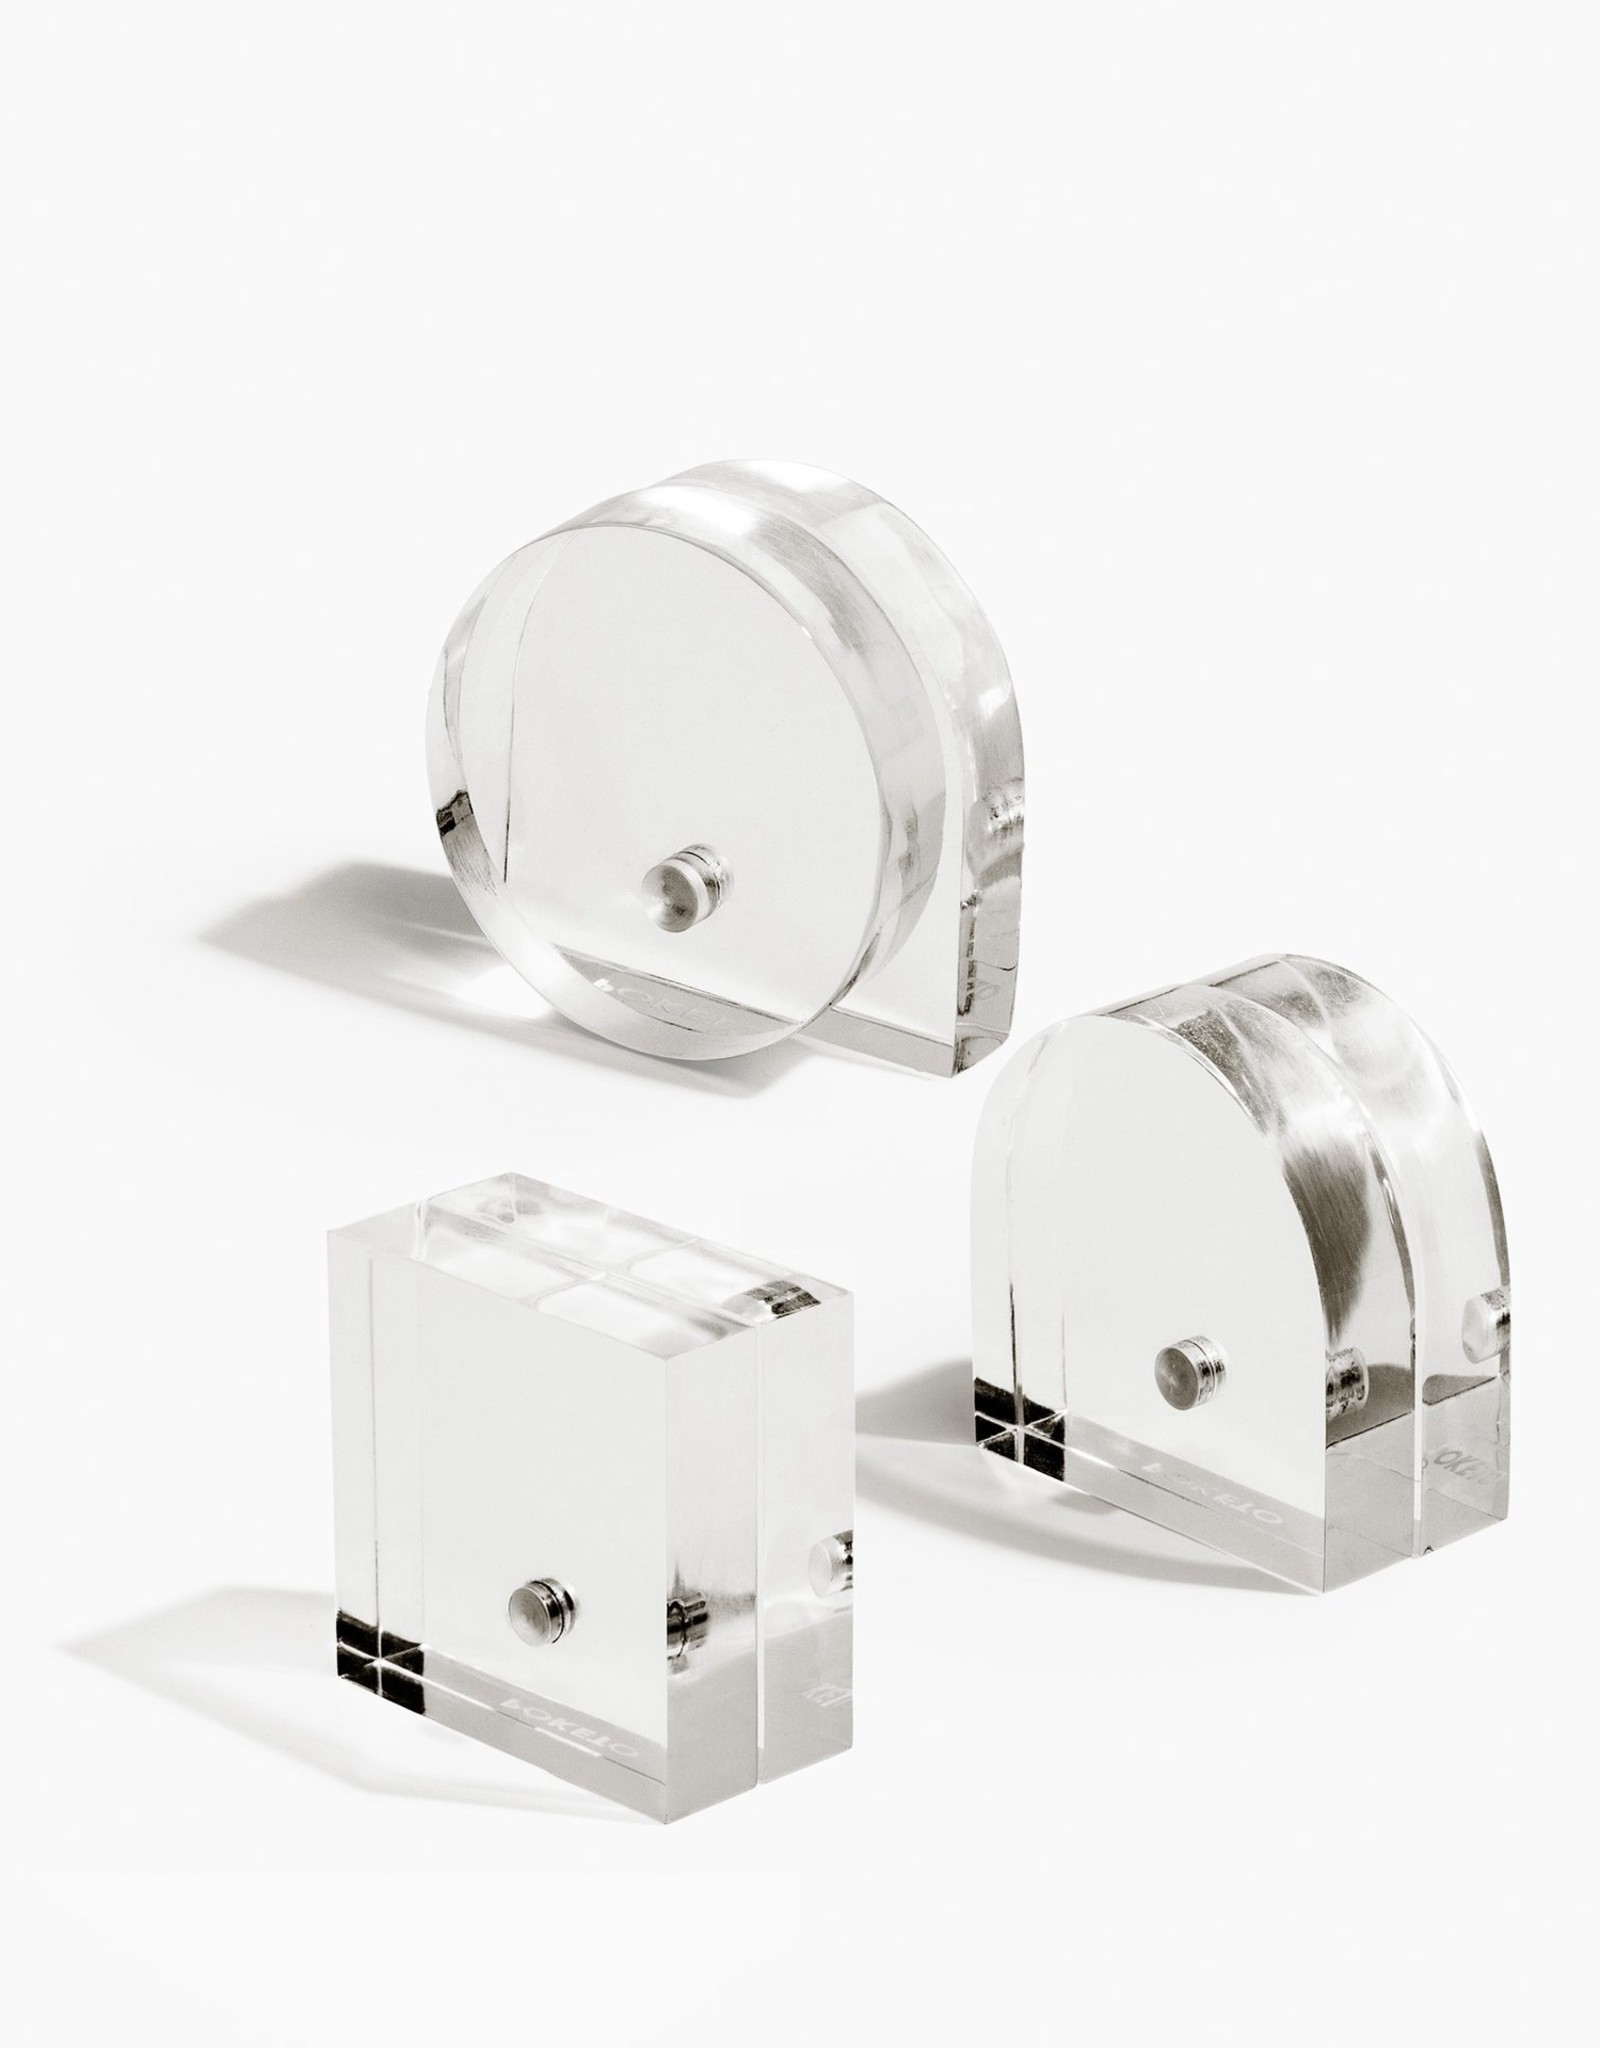 Poketo Shapes Magnet Stands Set